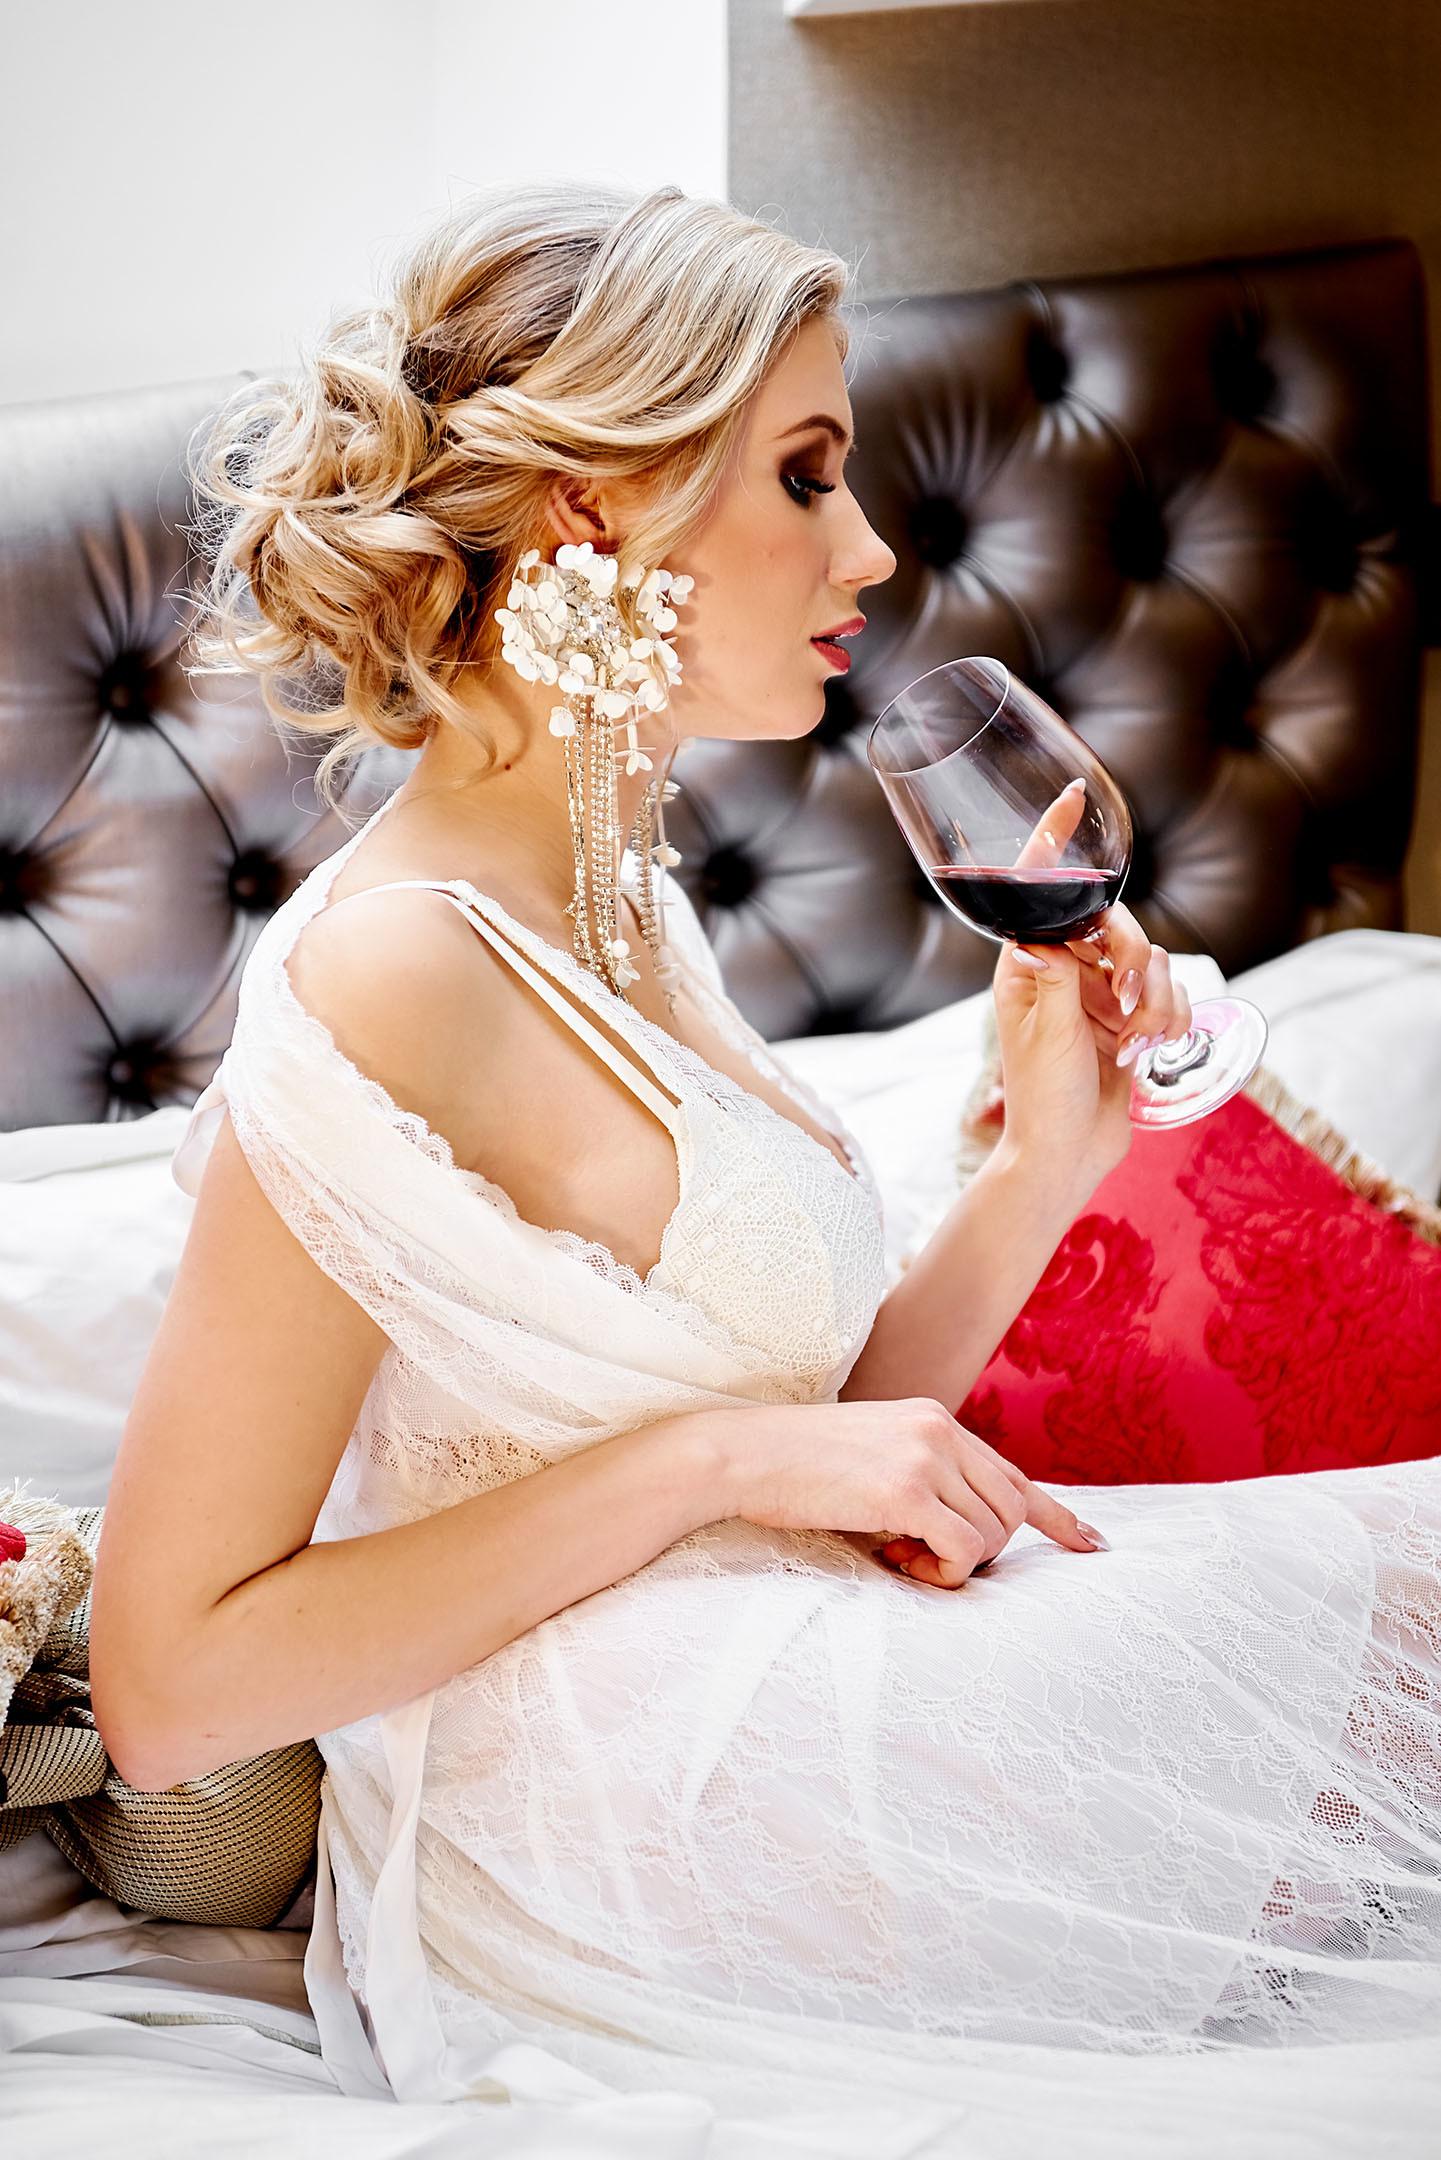 Свадебная фотосессия в отеле Маджестик (Majestic Boutique Hotel Deluxe)